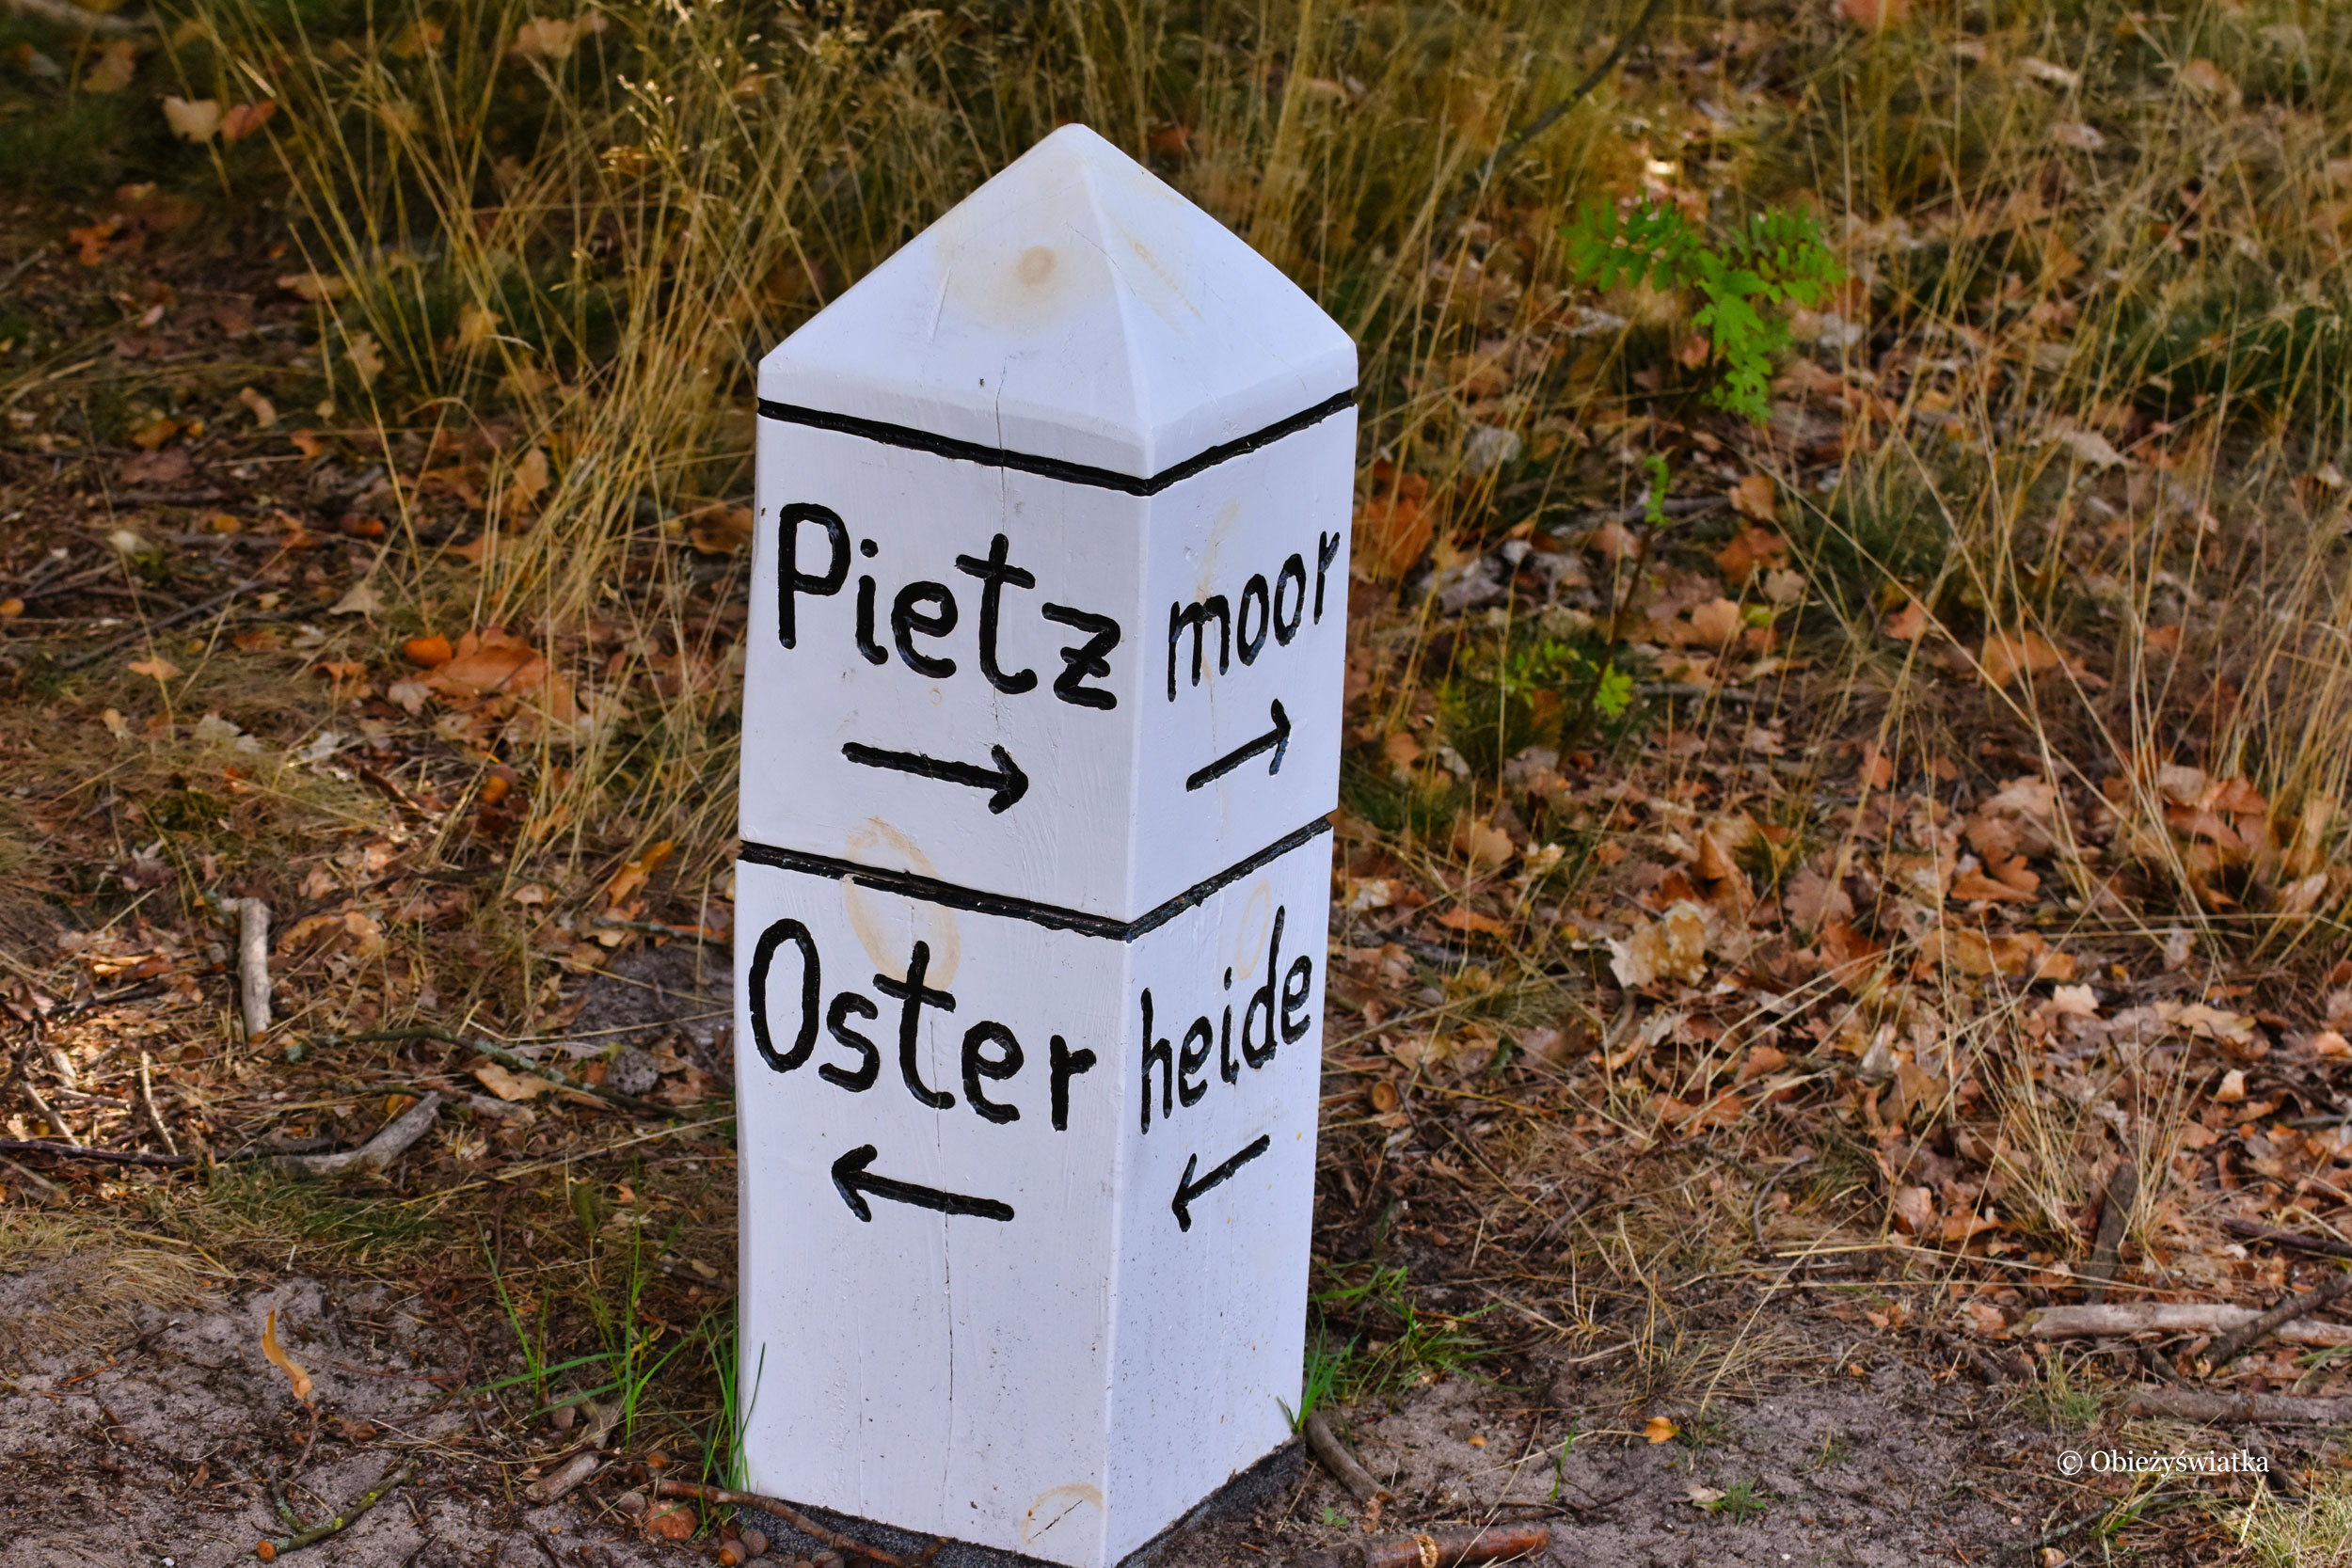 Oznakowanie, Lüneburger Heide, Niemcy